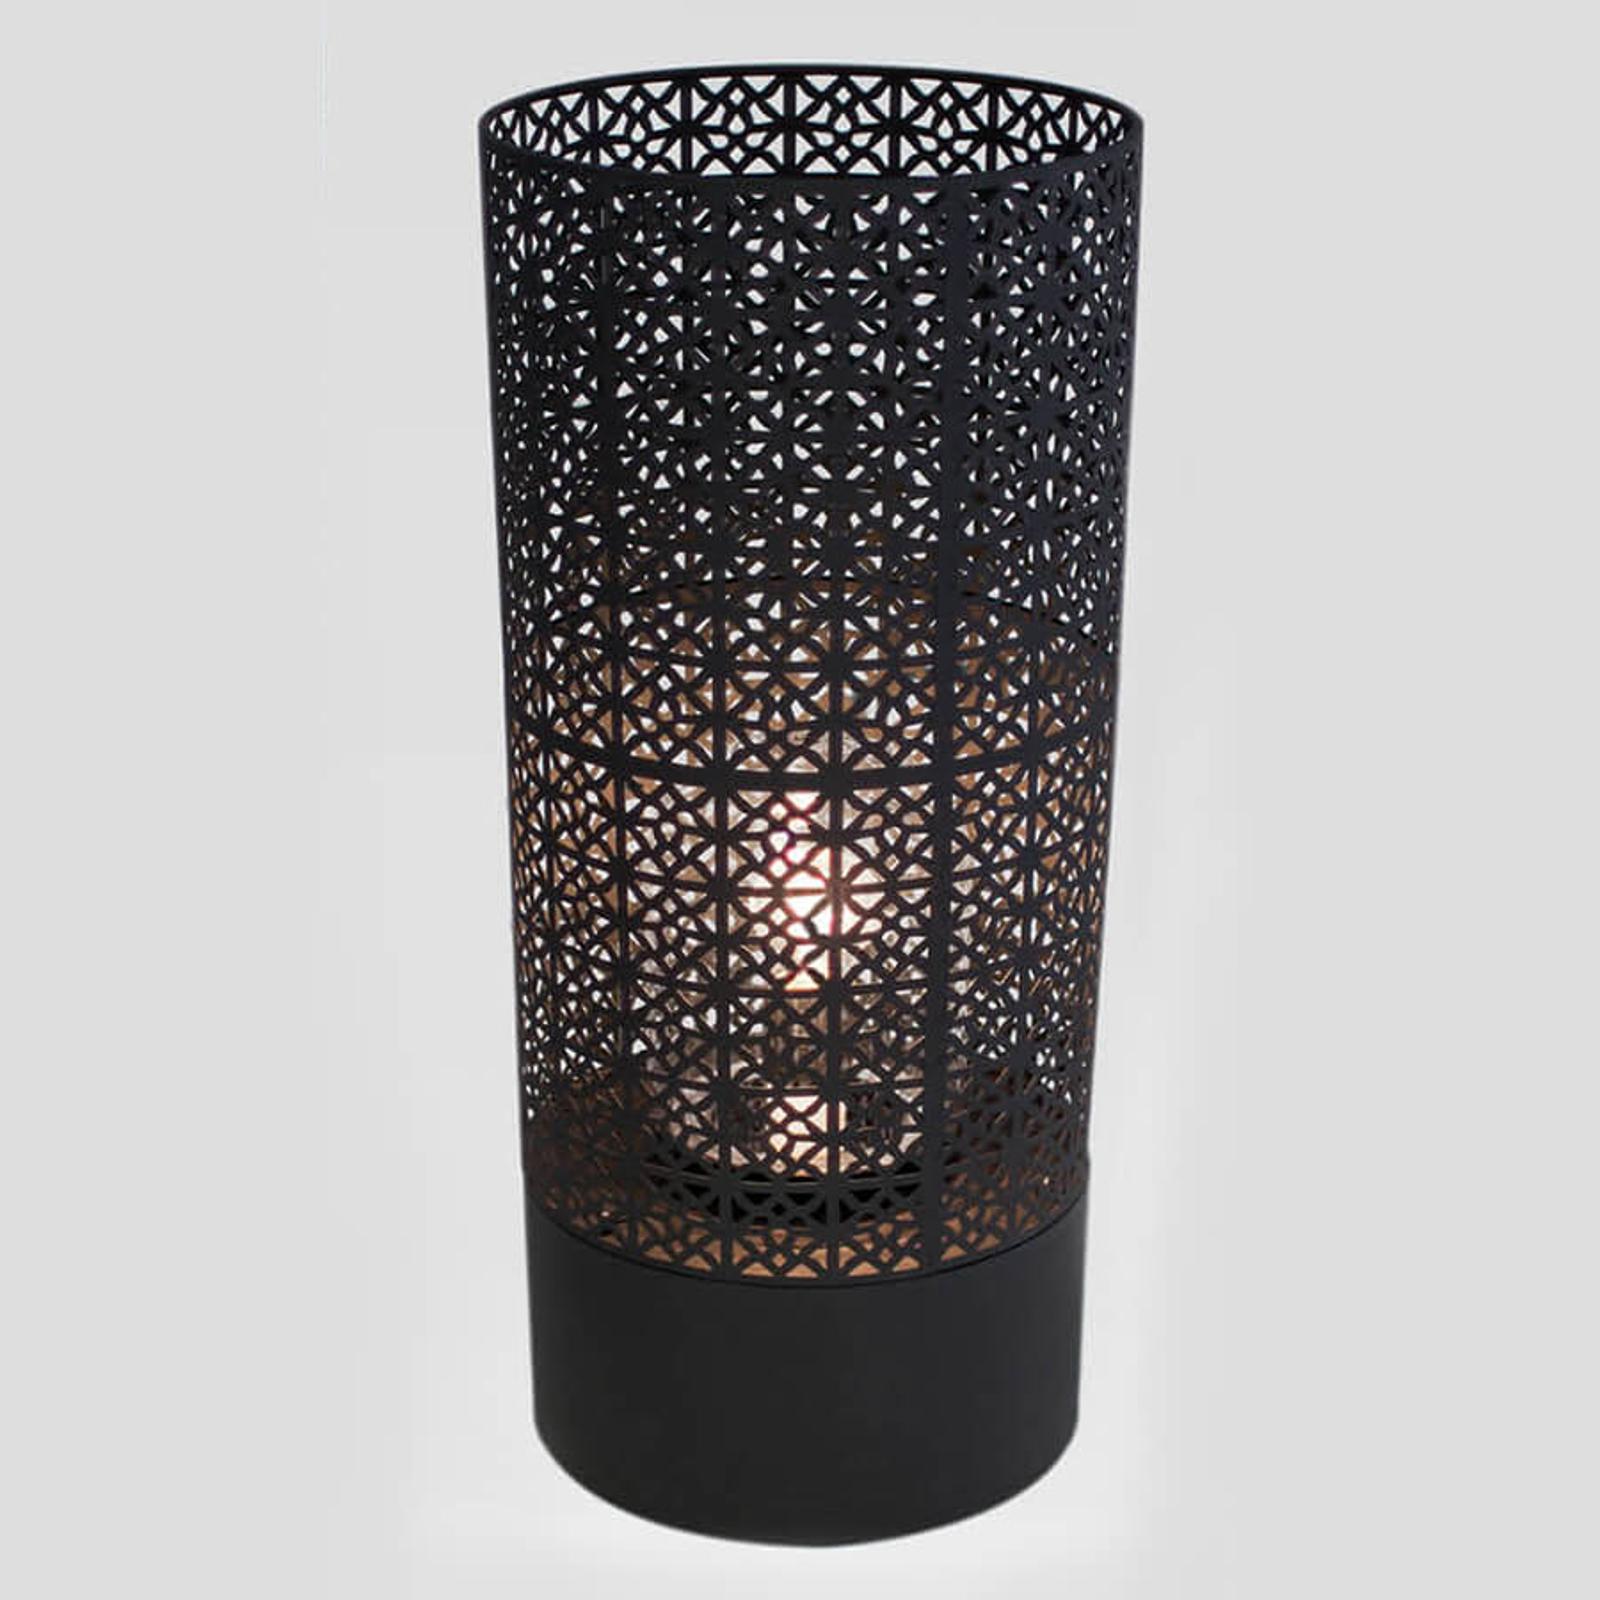 By Rydéns lampada da terrazza Maison nero 67cm